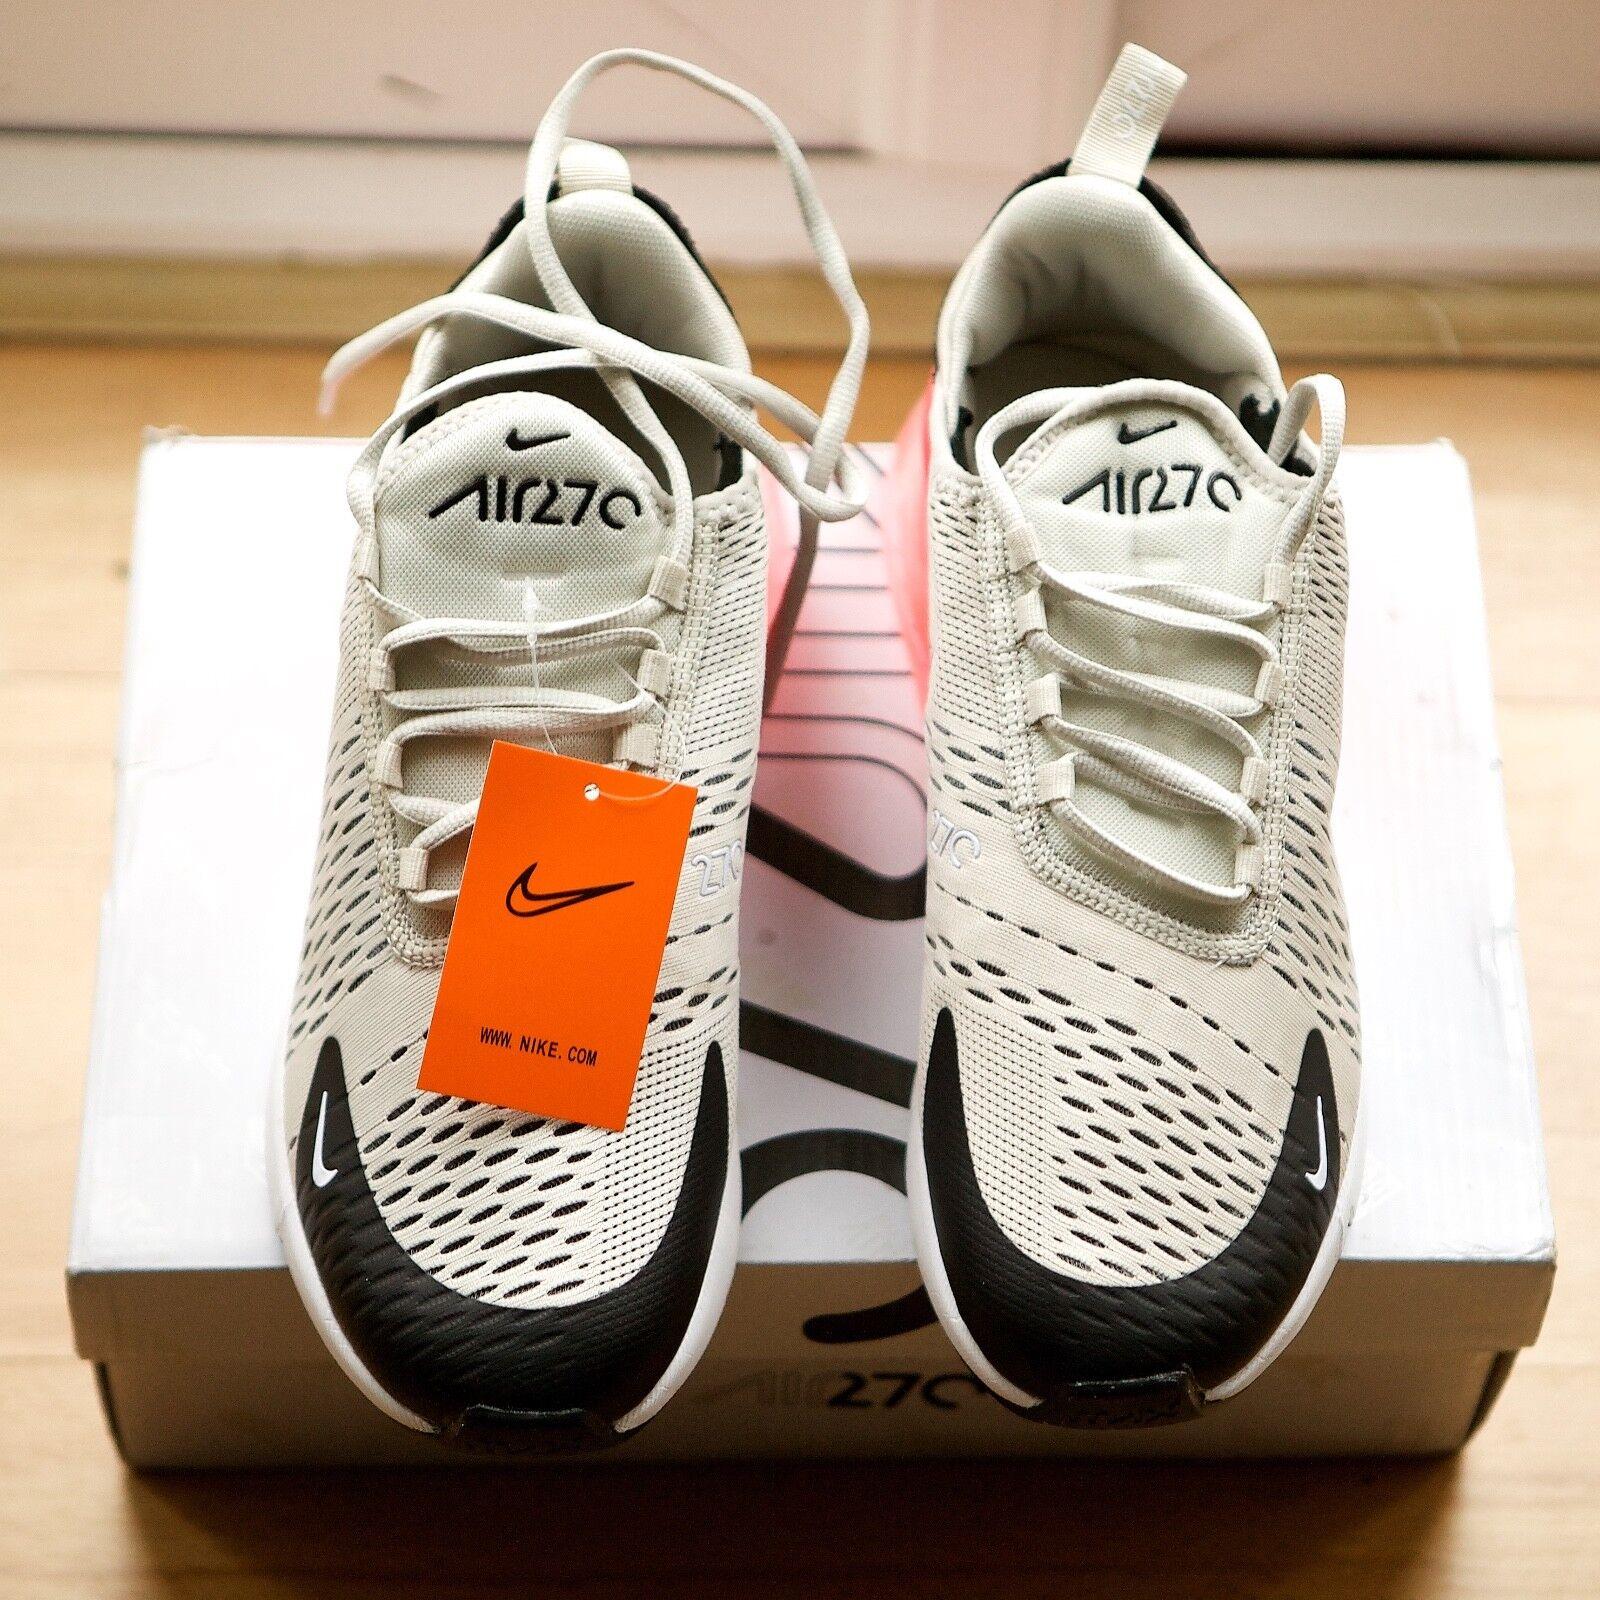 Nike Air Max 270 Size 13 Black Light